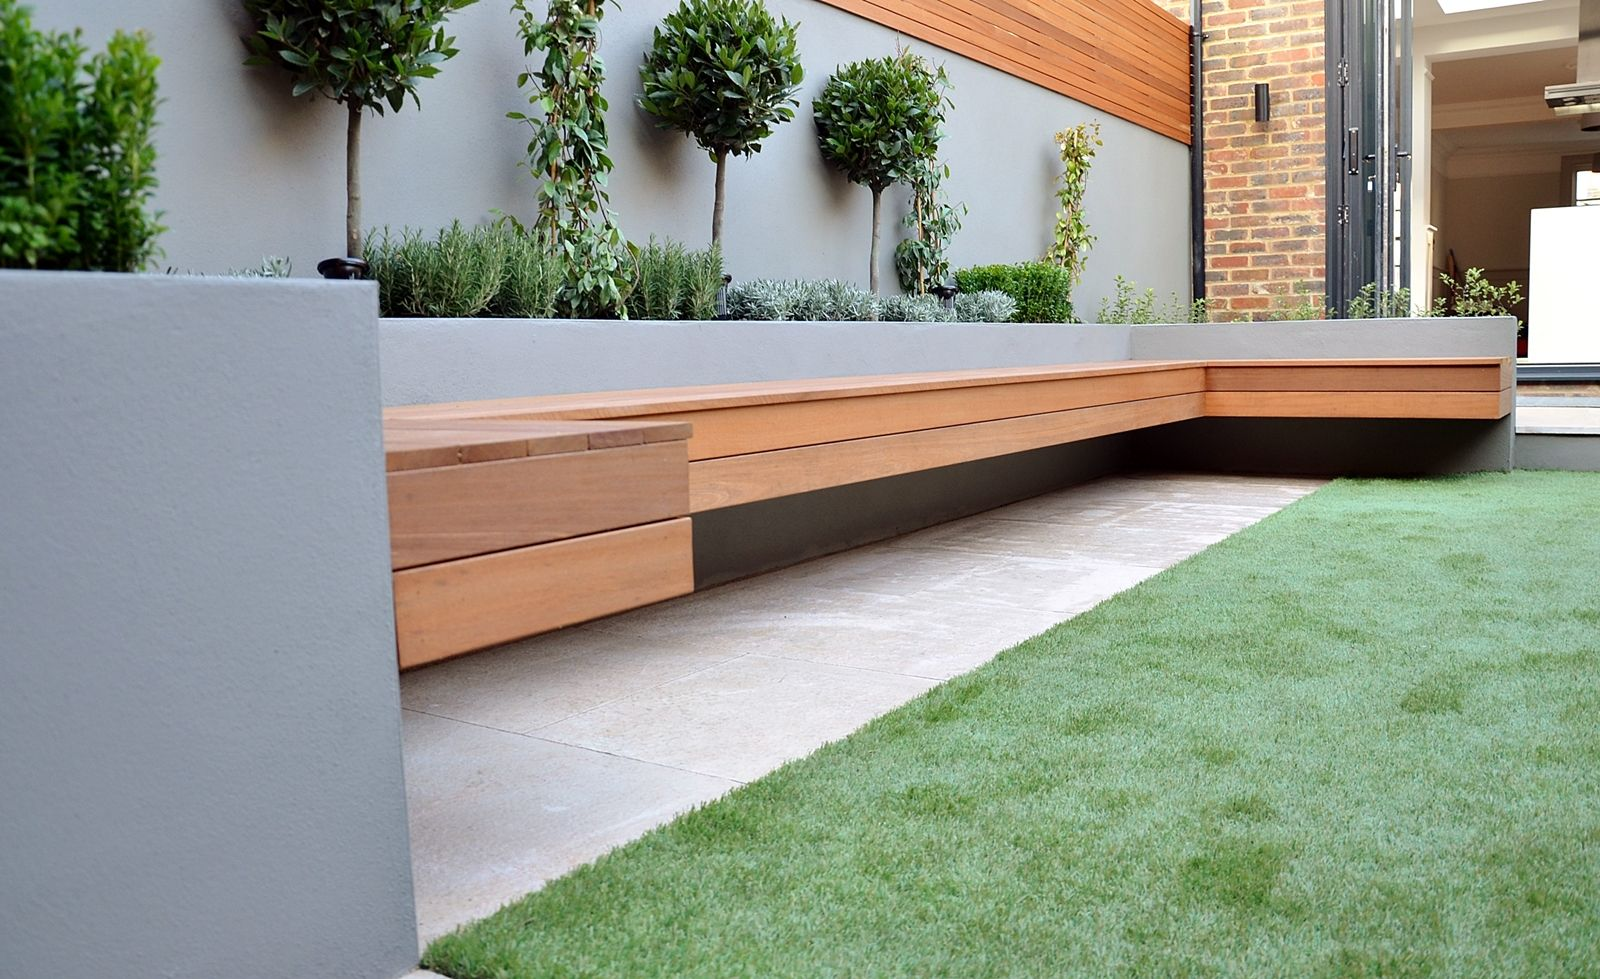 floating bench limestone cream light paving grey raised beds bay ...